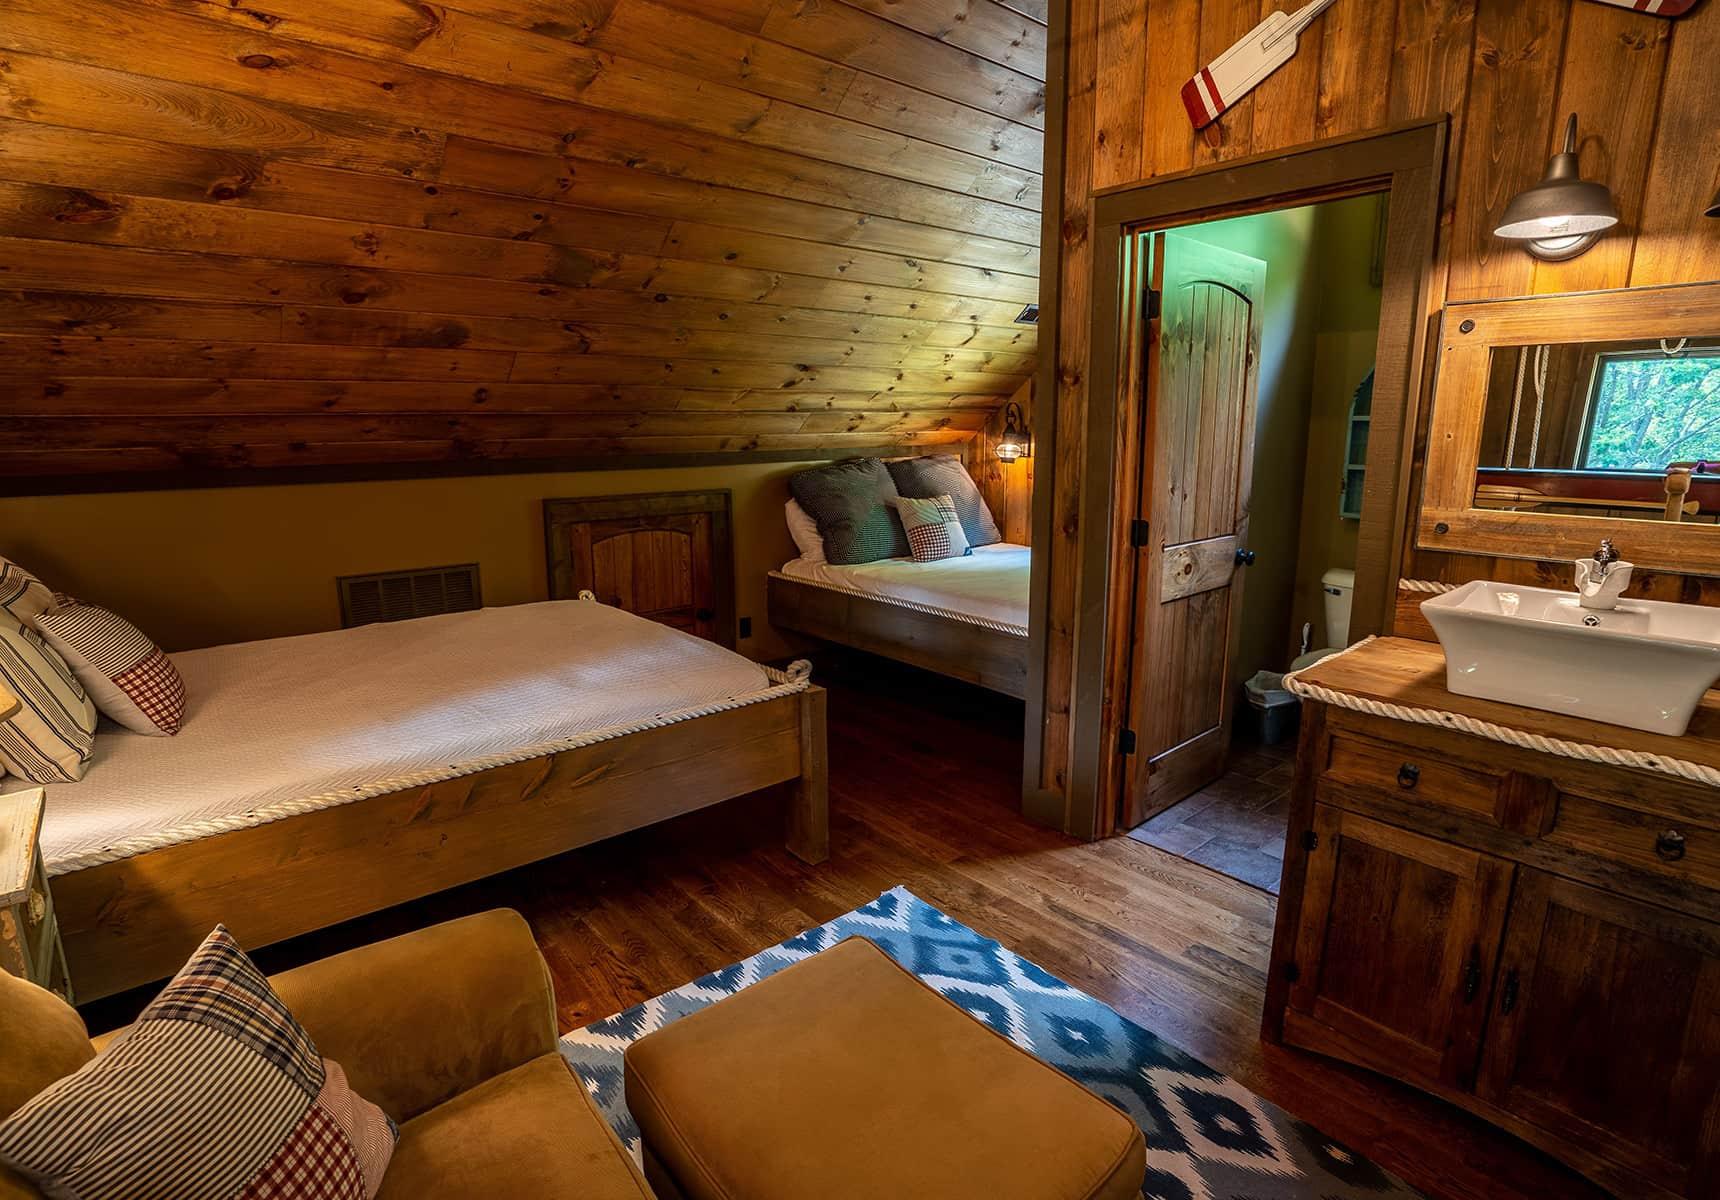 Boathouse loft - Monroe County Vacation Rentals